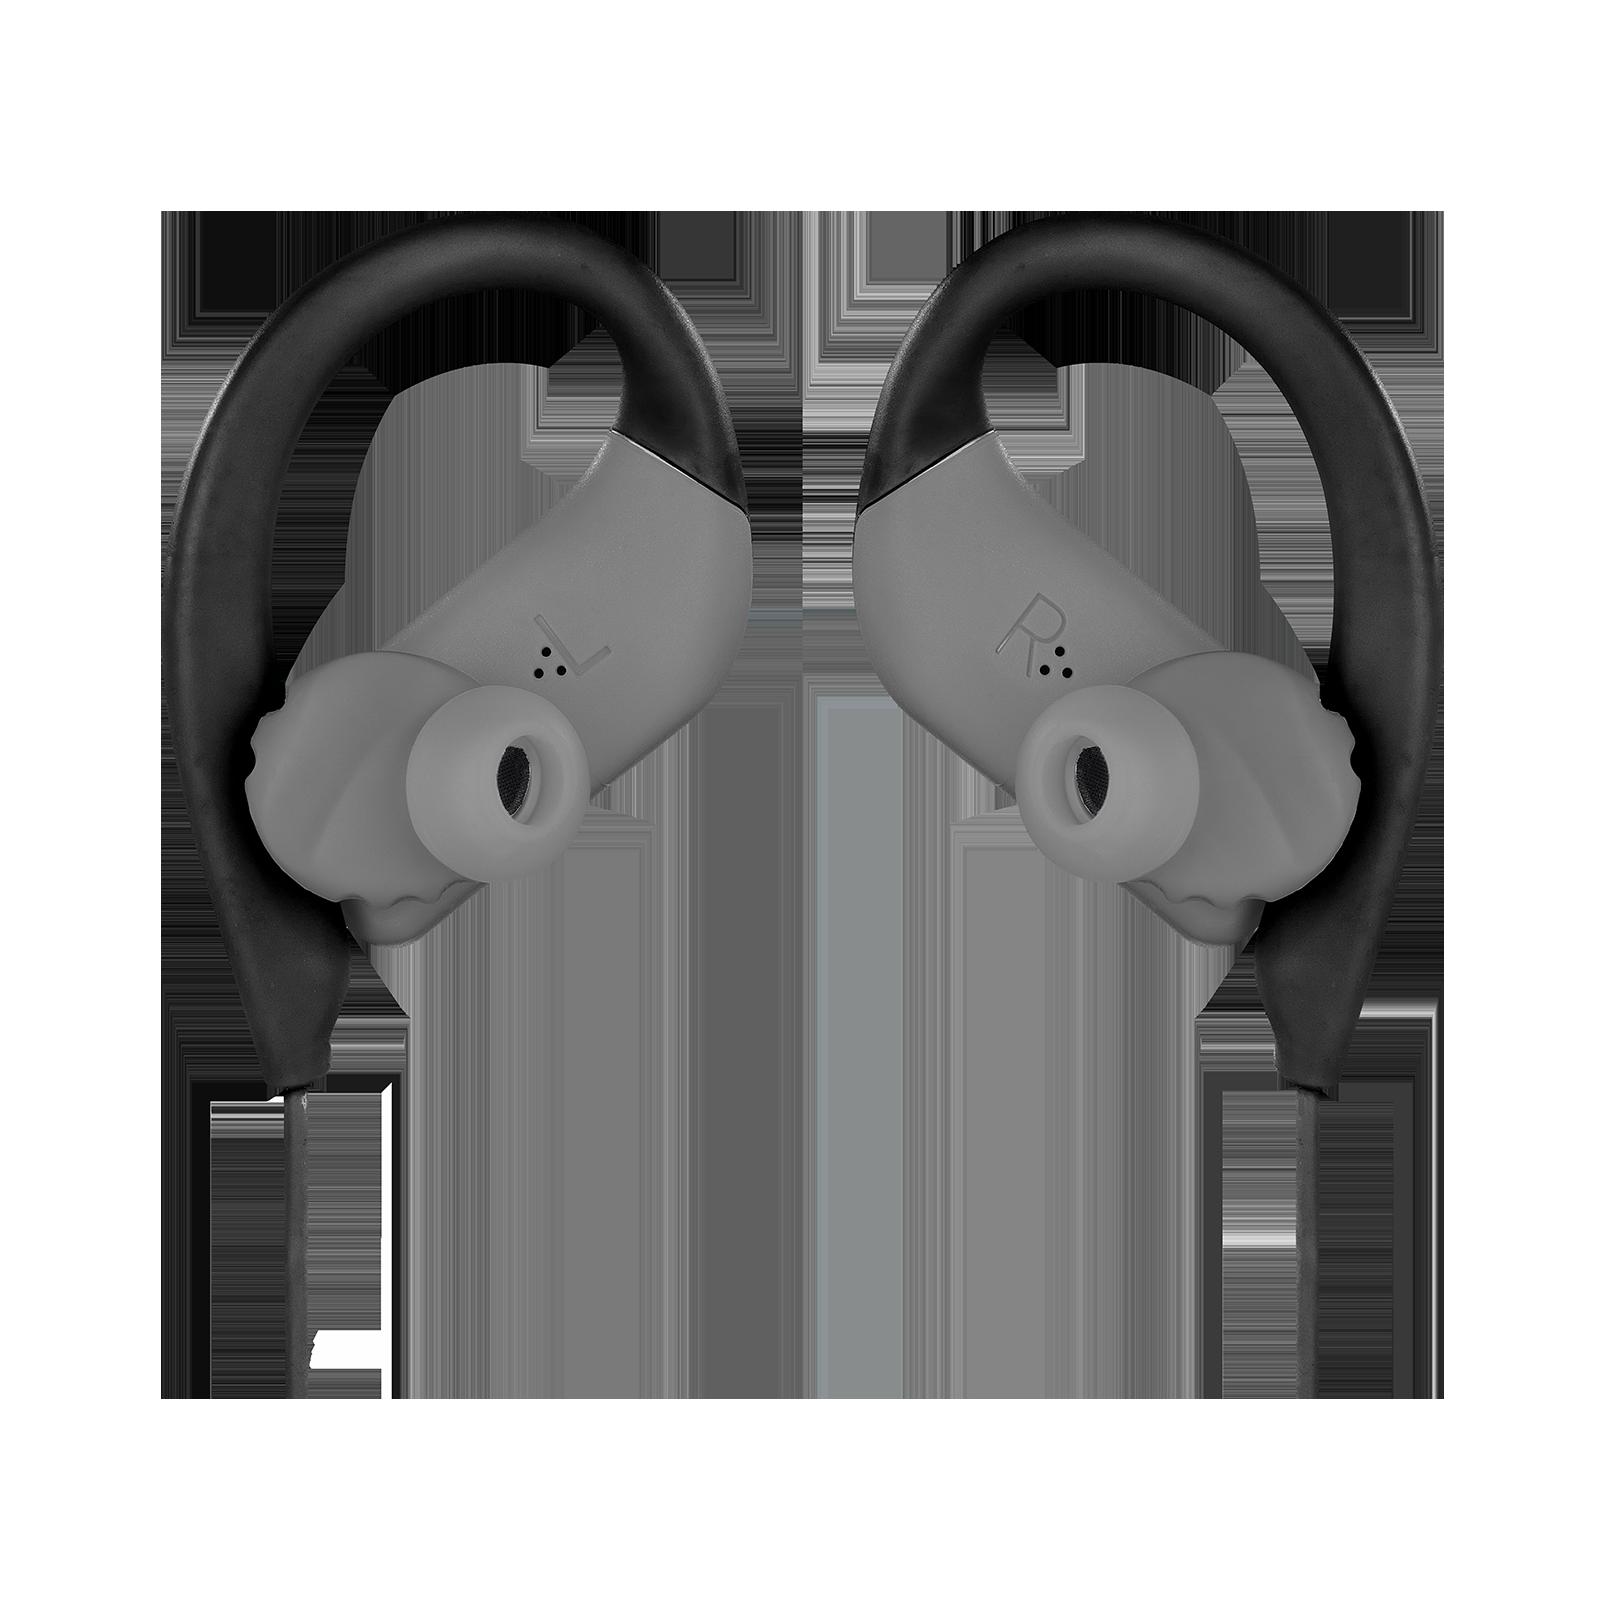 JBL Endurance SPRINT - Black - Waterproof Wireless In-Ear Sport Headphones - Detailshot 3